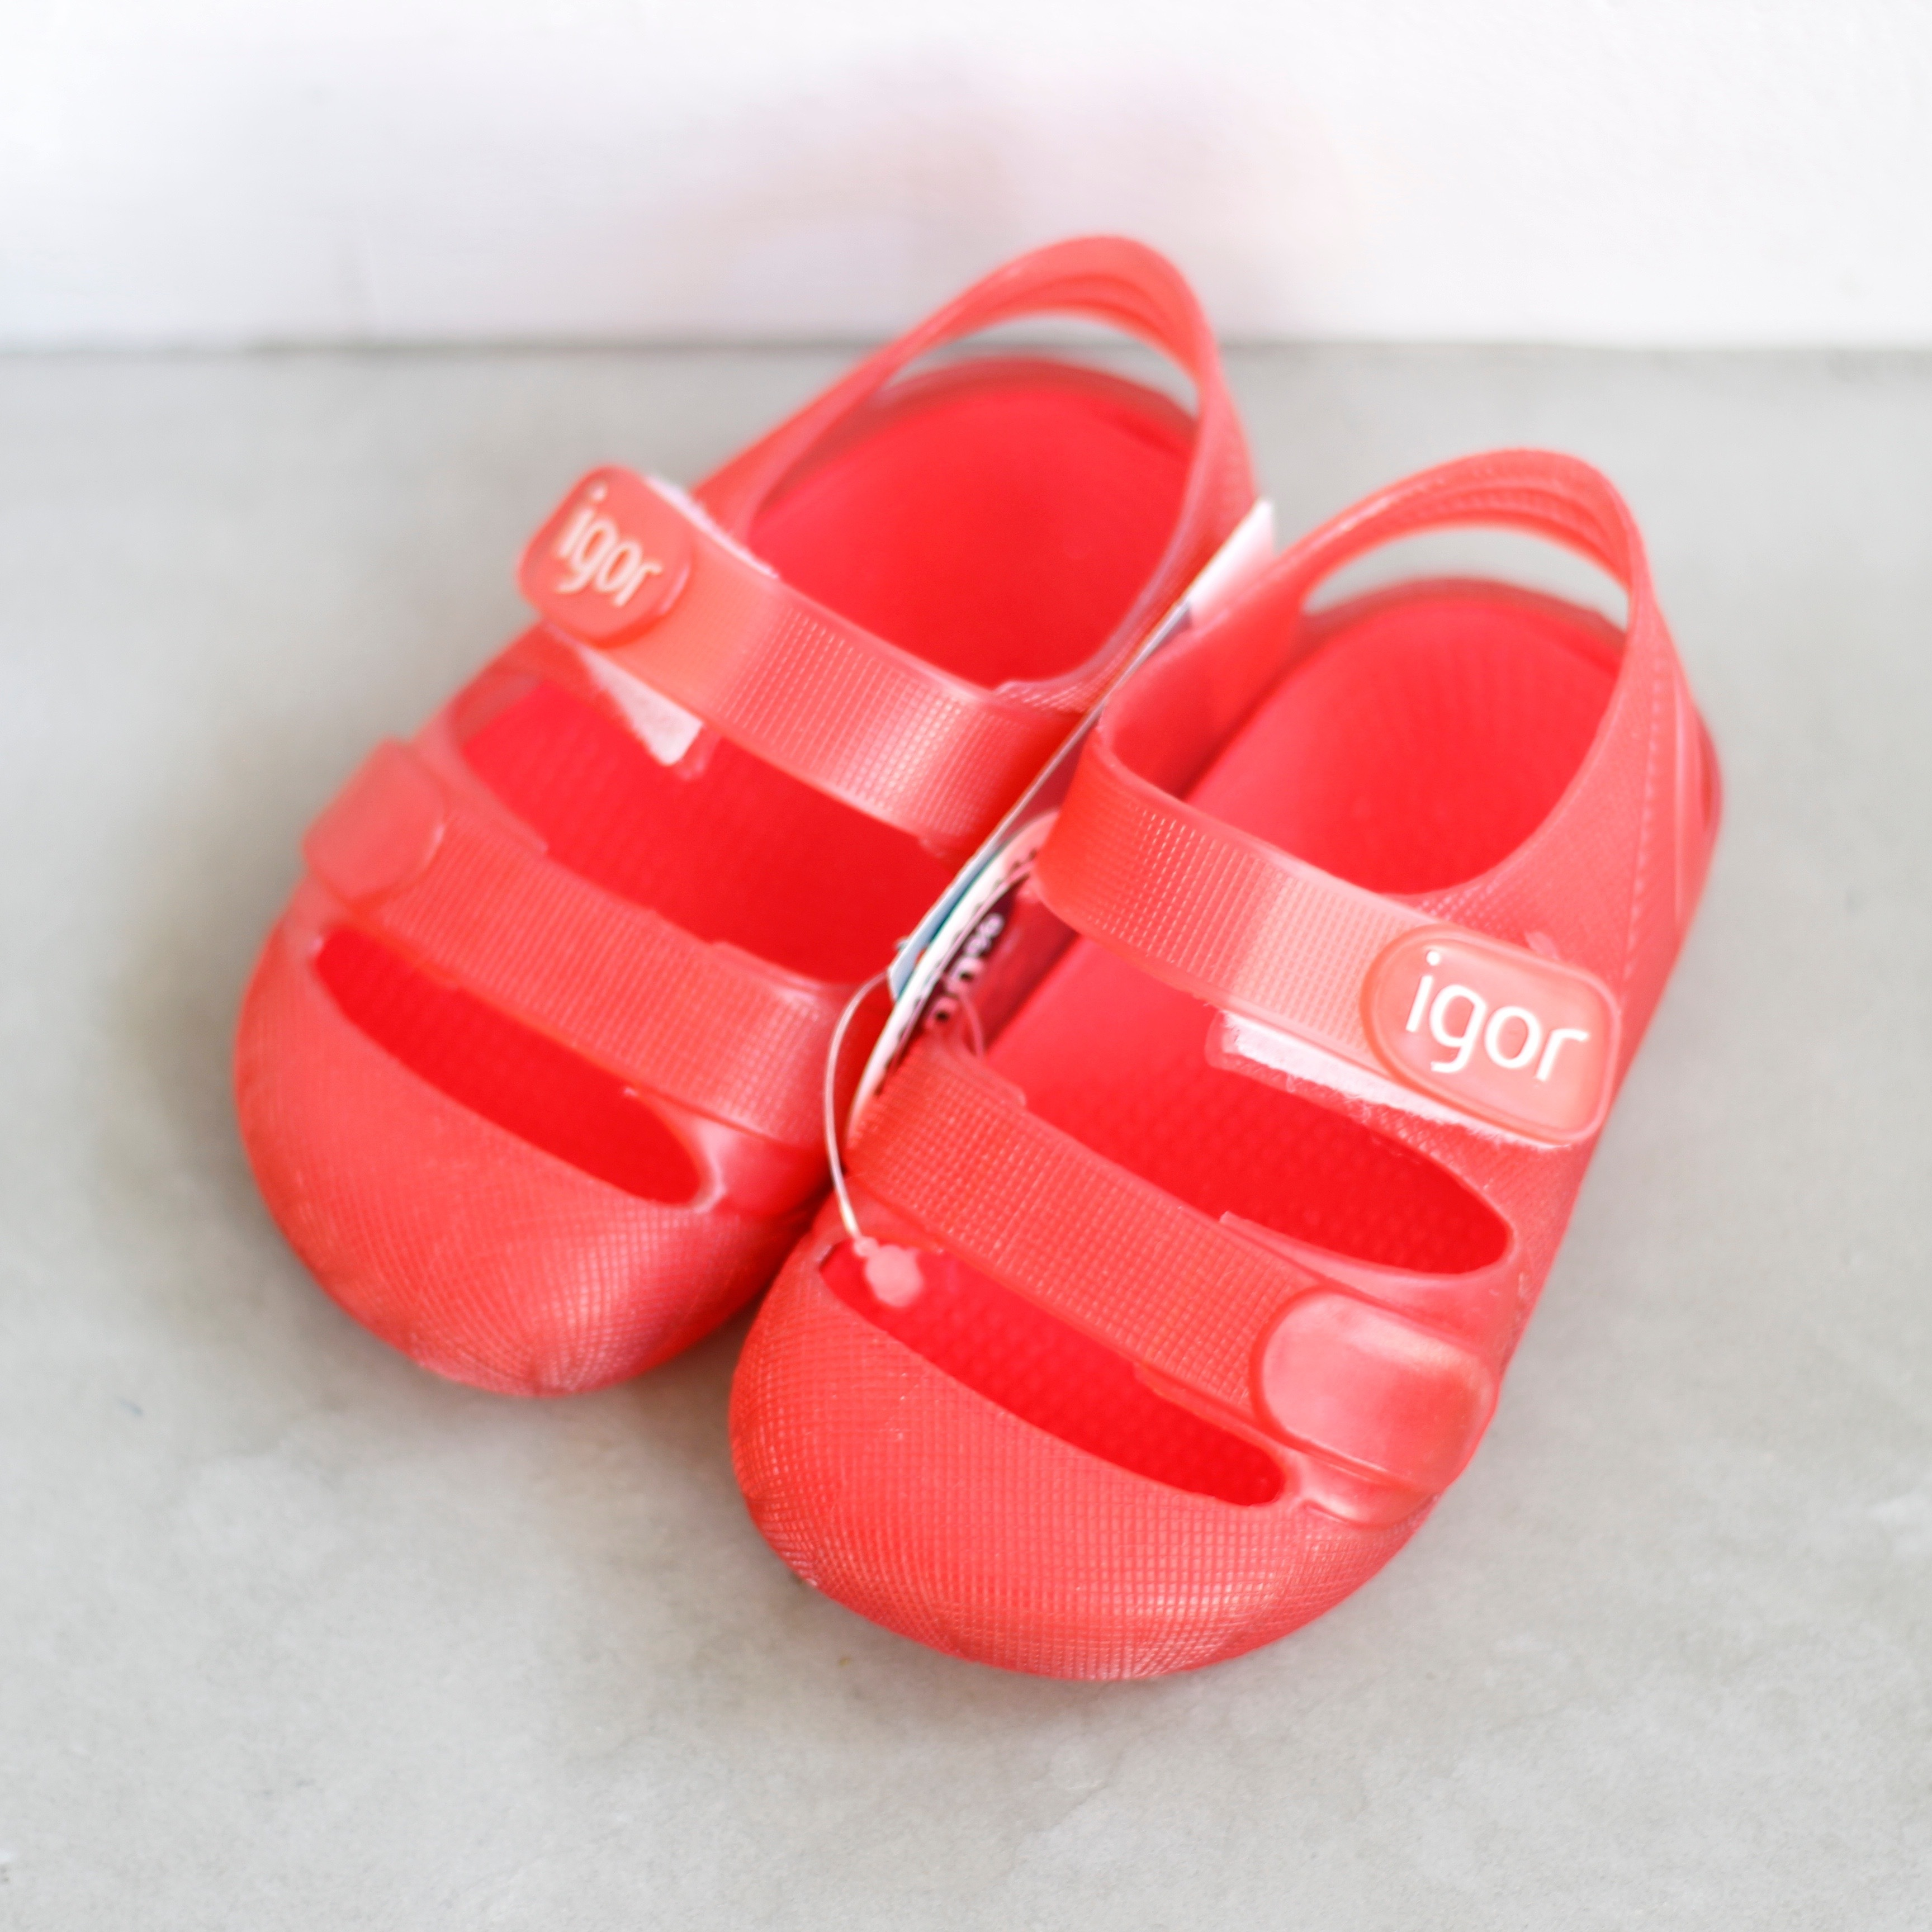 《igor》BONDI / Rojo(red)/ 16.5cm・17cm